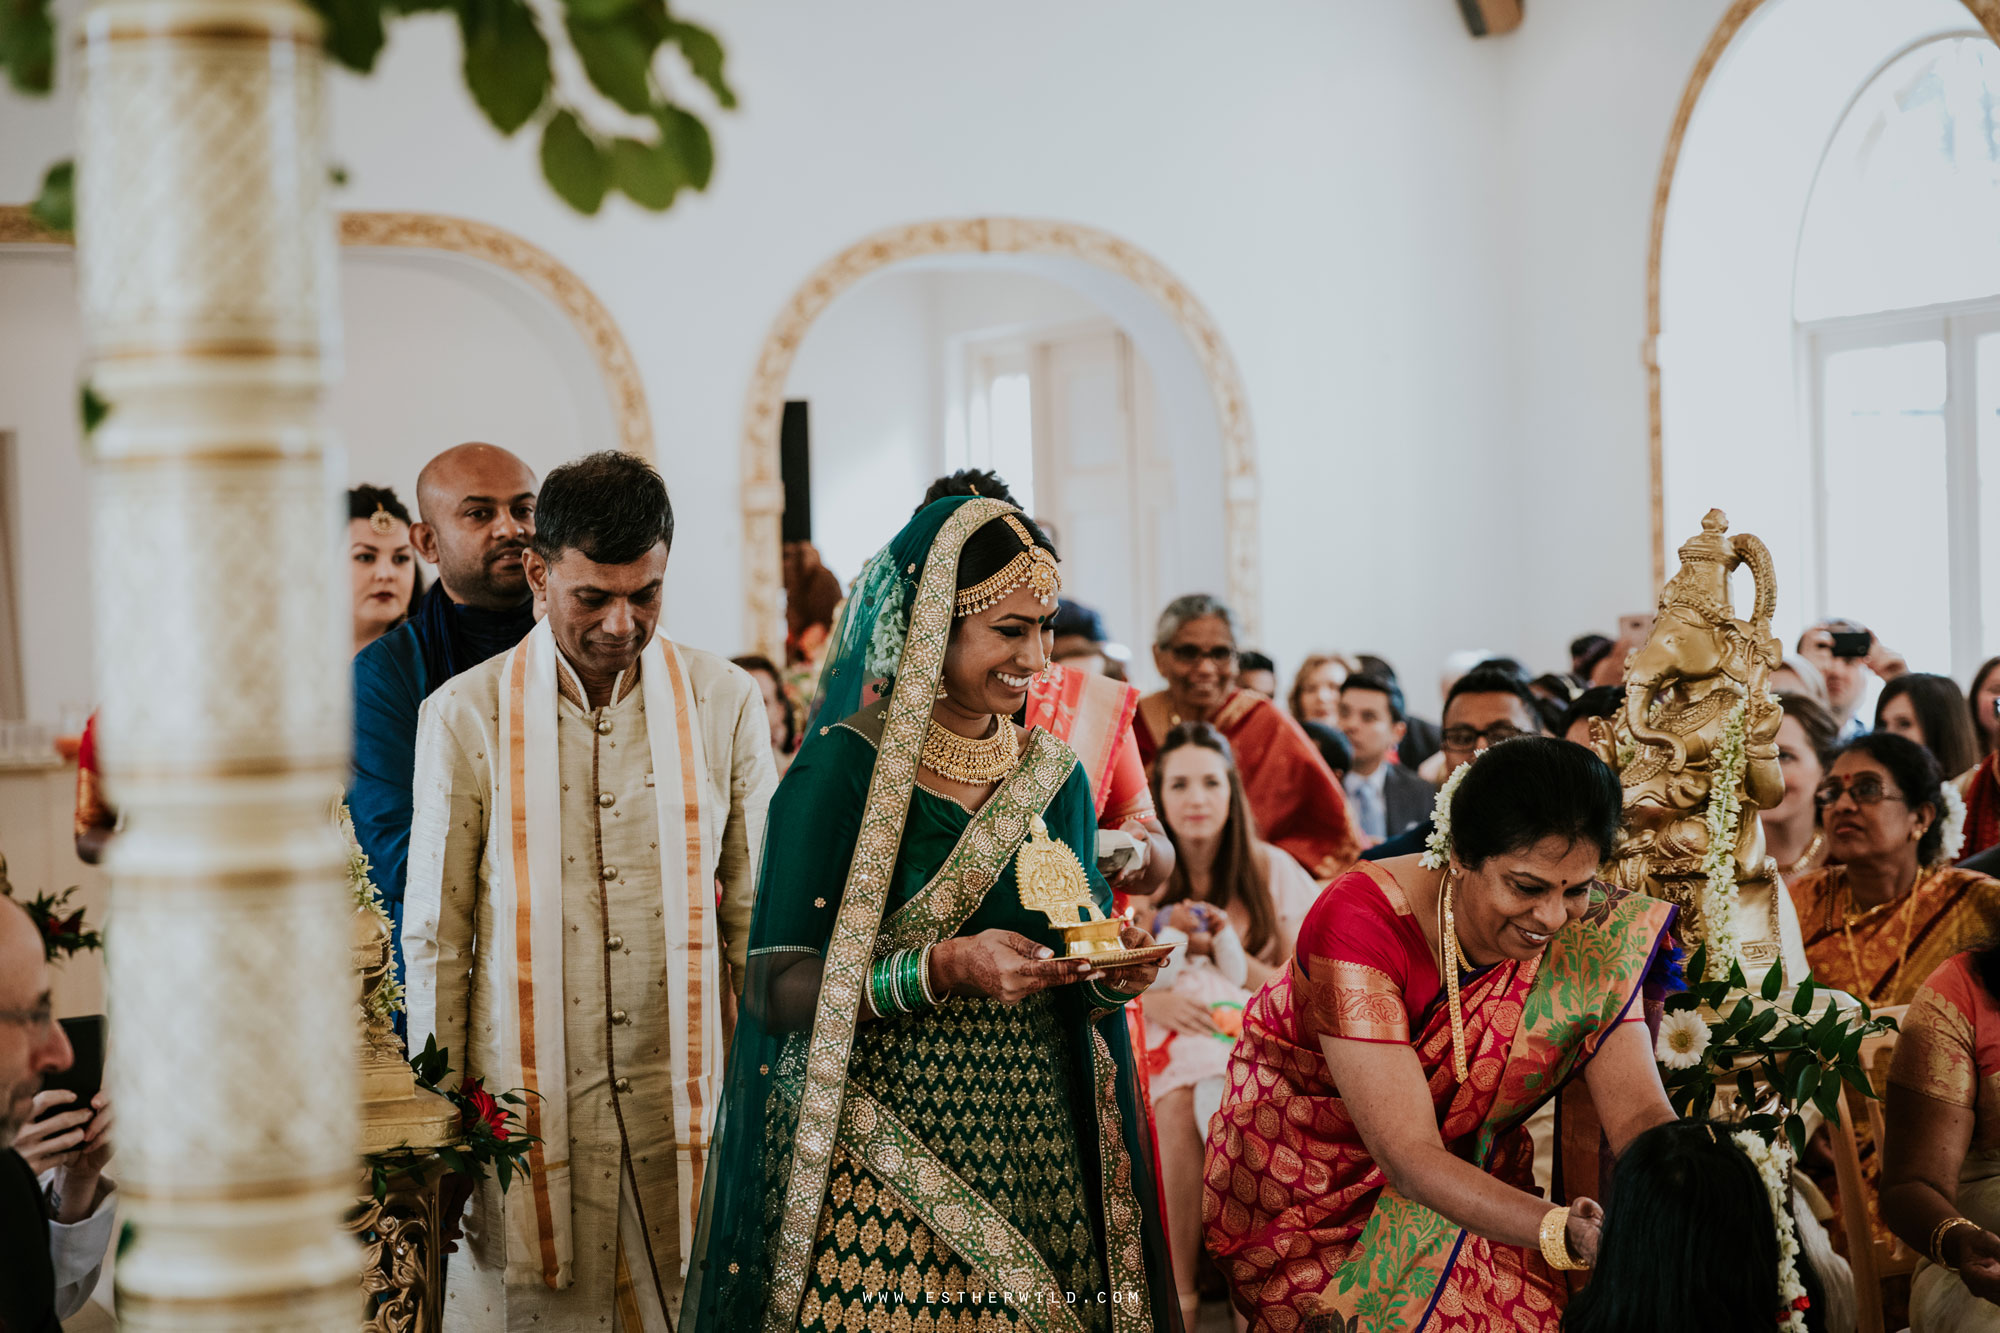 Northbrook_Park_Farnham_Surrey_London_Wedding_Hindu_Fusion_Esther_Wild_Photographer_IMG_3824.jpg